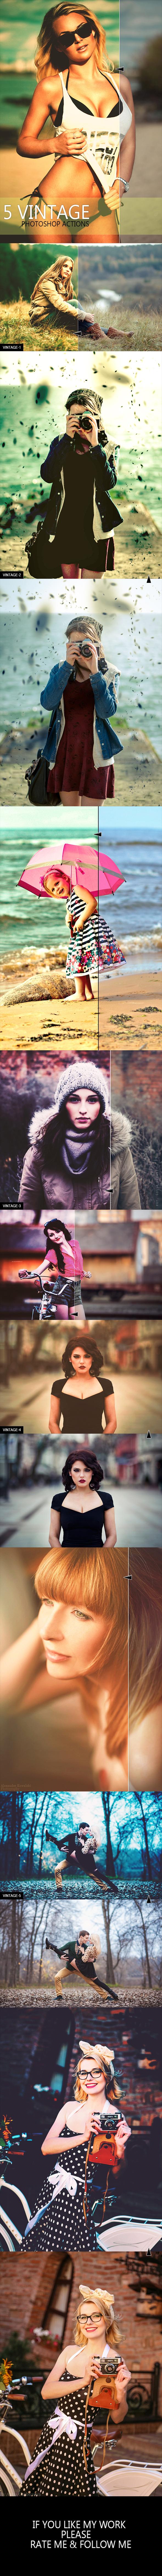 GraphicRiver 5 Vintage Photoshop Action 11562781